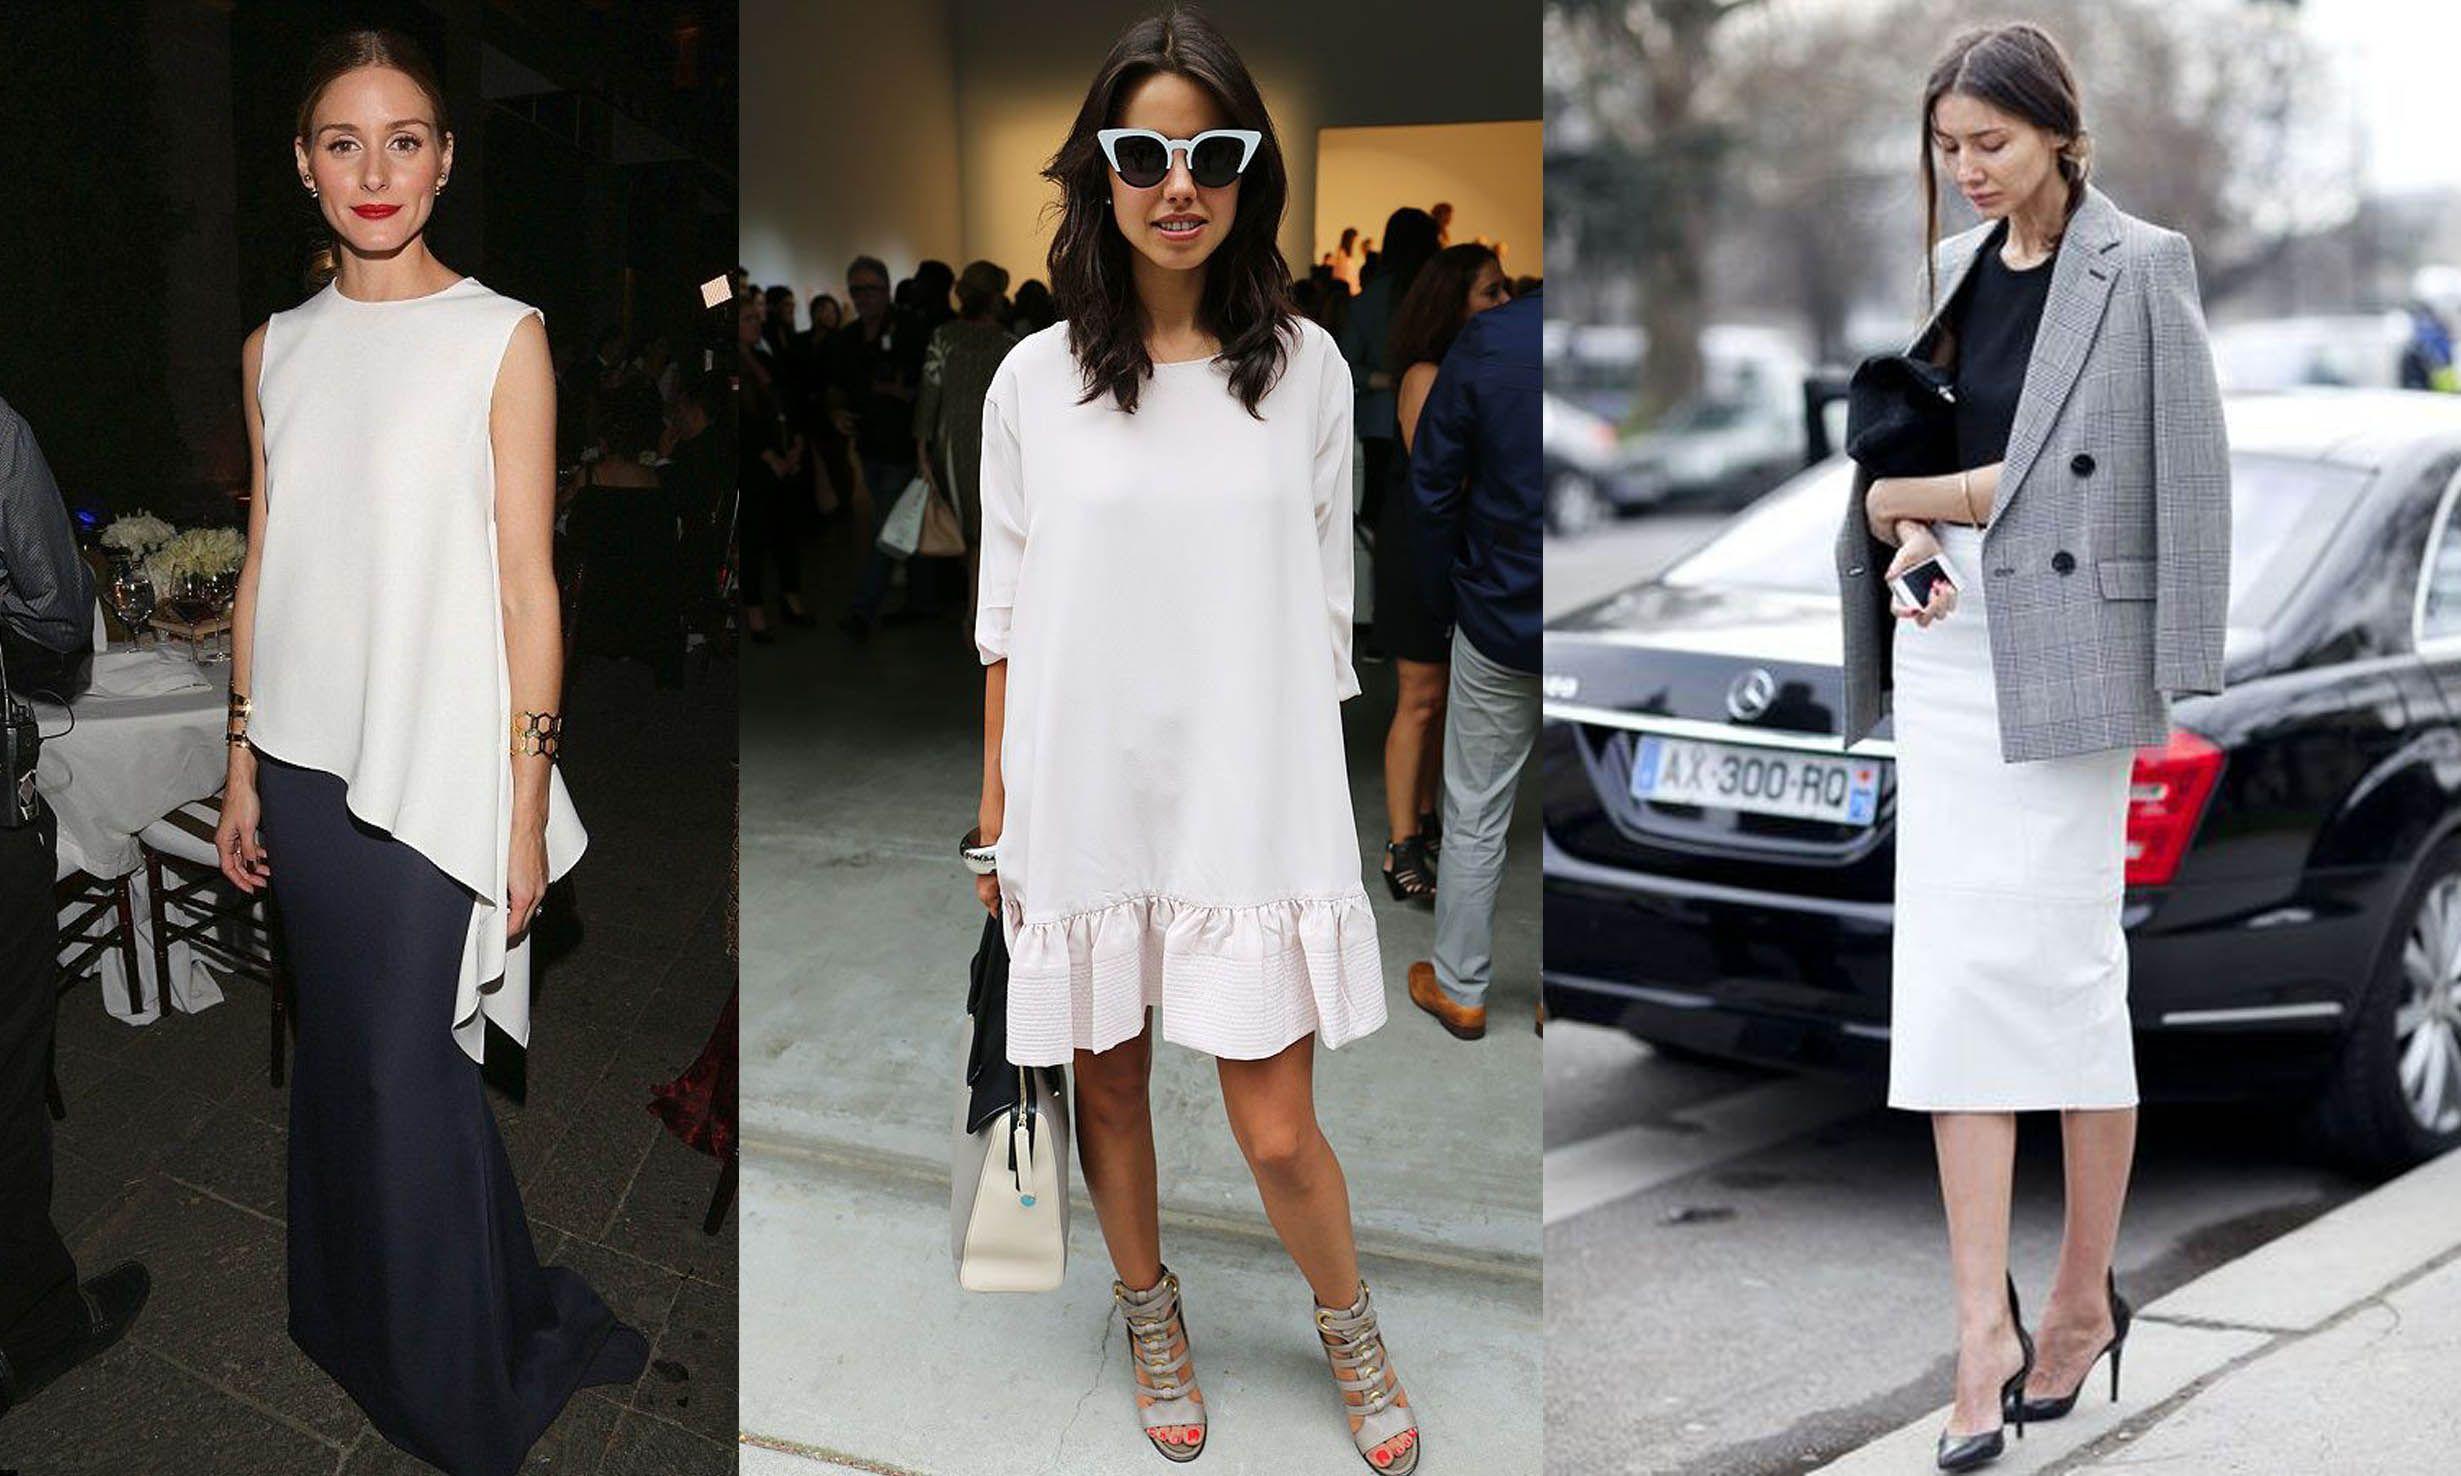 Intip, Yuk Monochrome, Si Hitam Putih Favorit Fashionistas